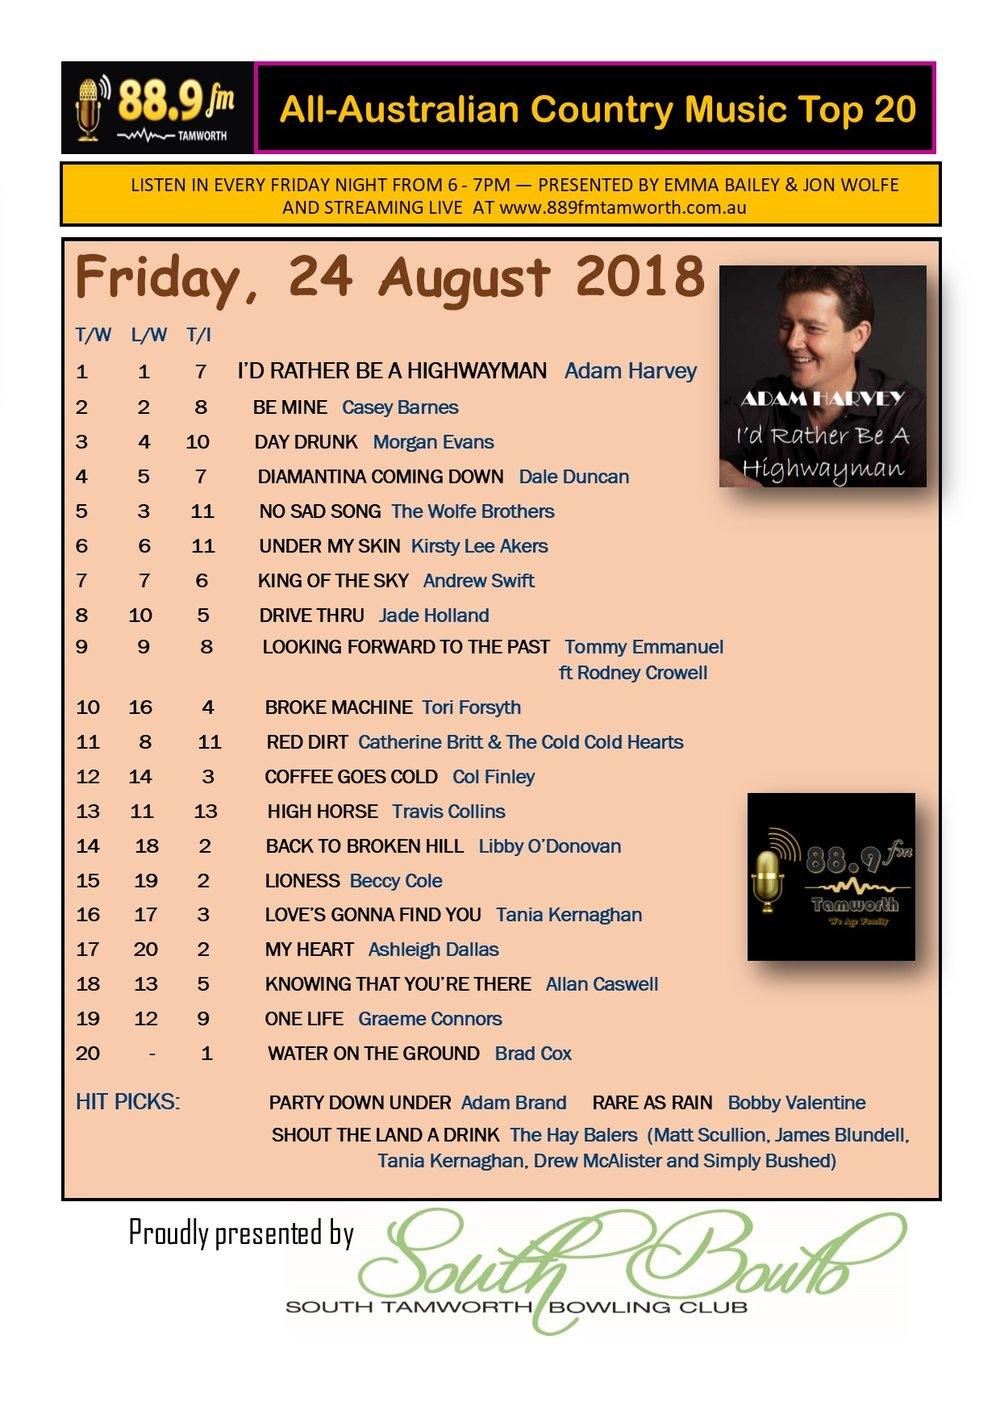 889FM CHART 24 August 2018.jpg